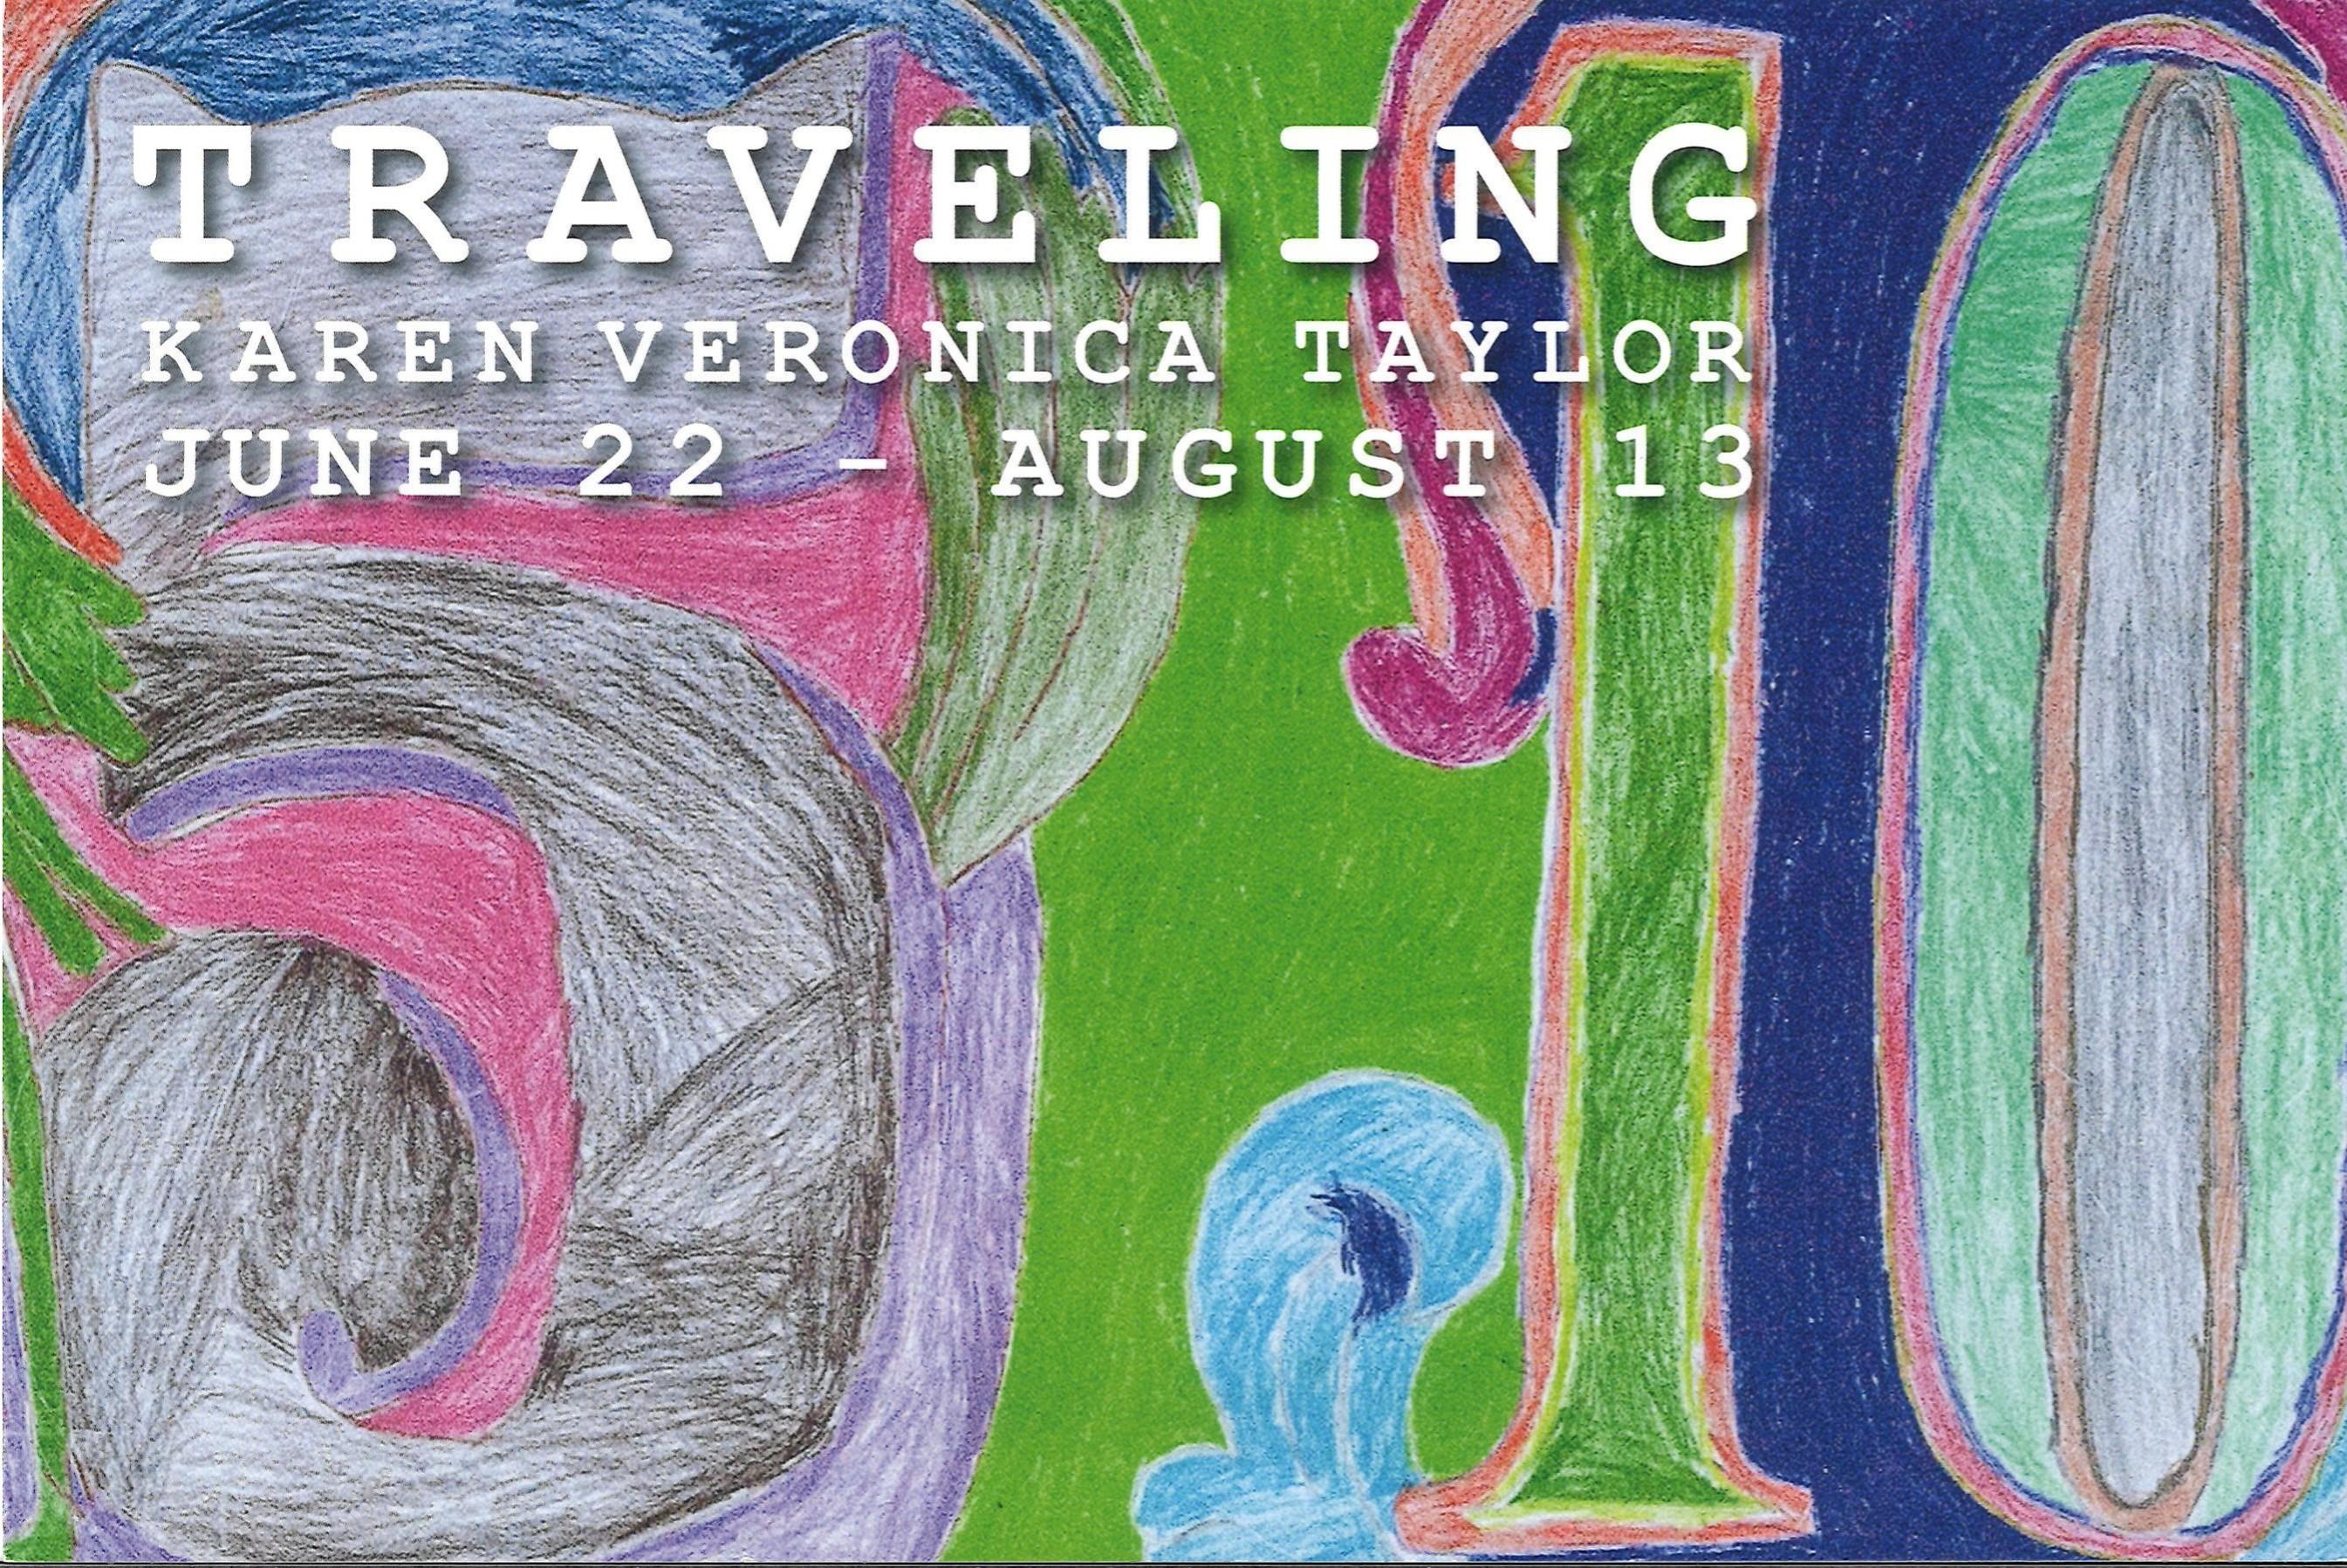 Traveling: Karen Veronica Taylor